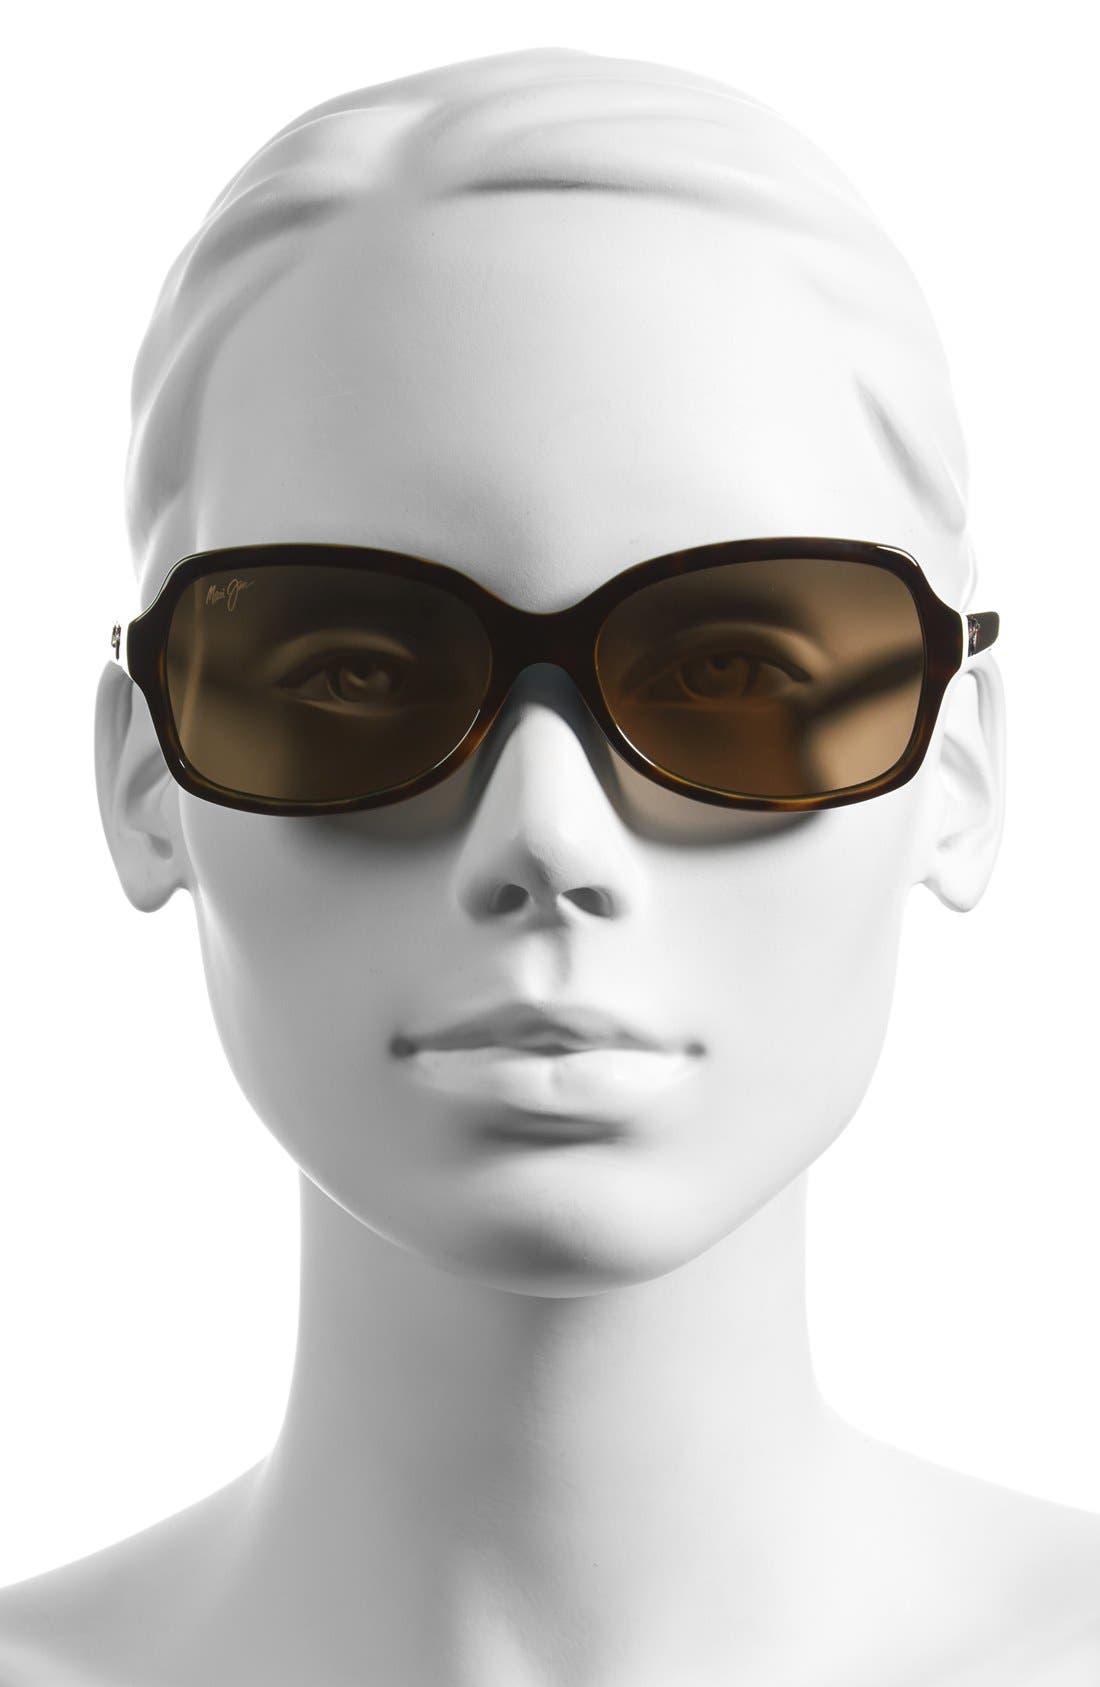 Cloud Break 56mm PolarizedPlus2<sup>®</sup> Sunglasses,                             Alternate thumbnail 2, color,                             TORTOISE PEACOCK/ BLUE/ BRONZE